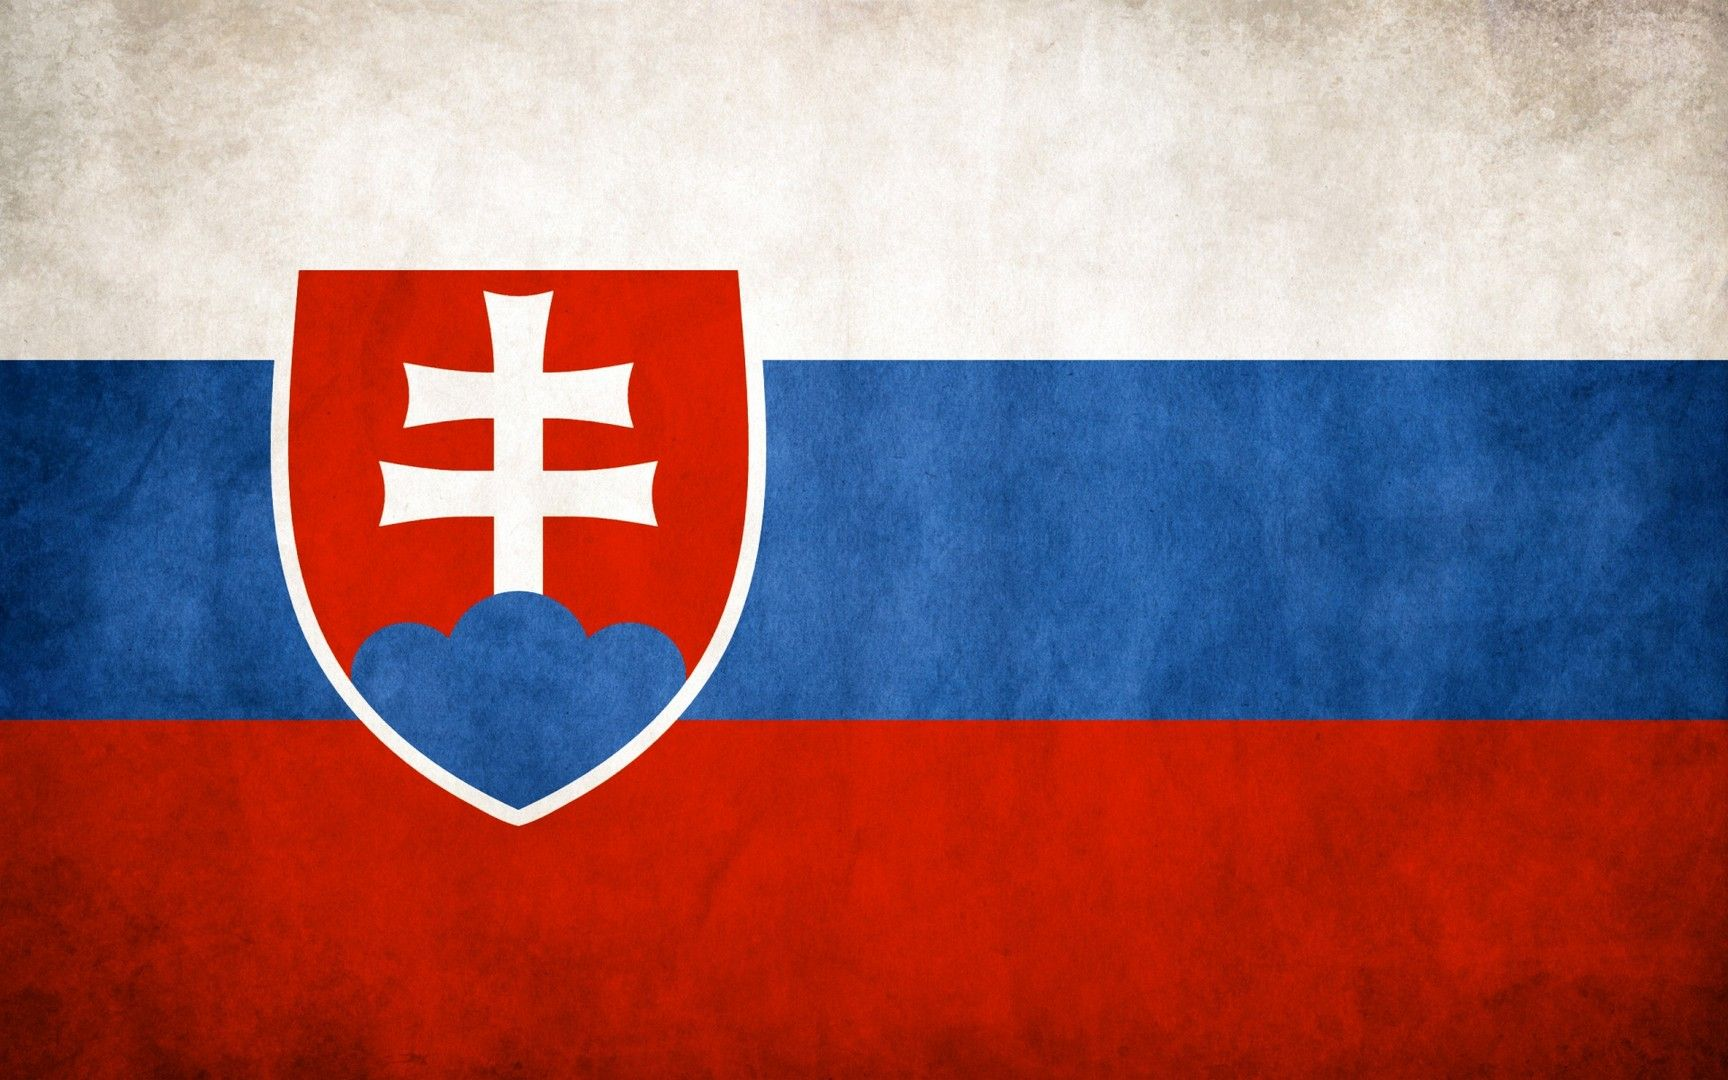 Flag of Slovakia wallpaper Flags wallpaper 1728x1080